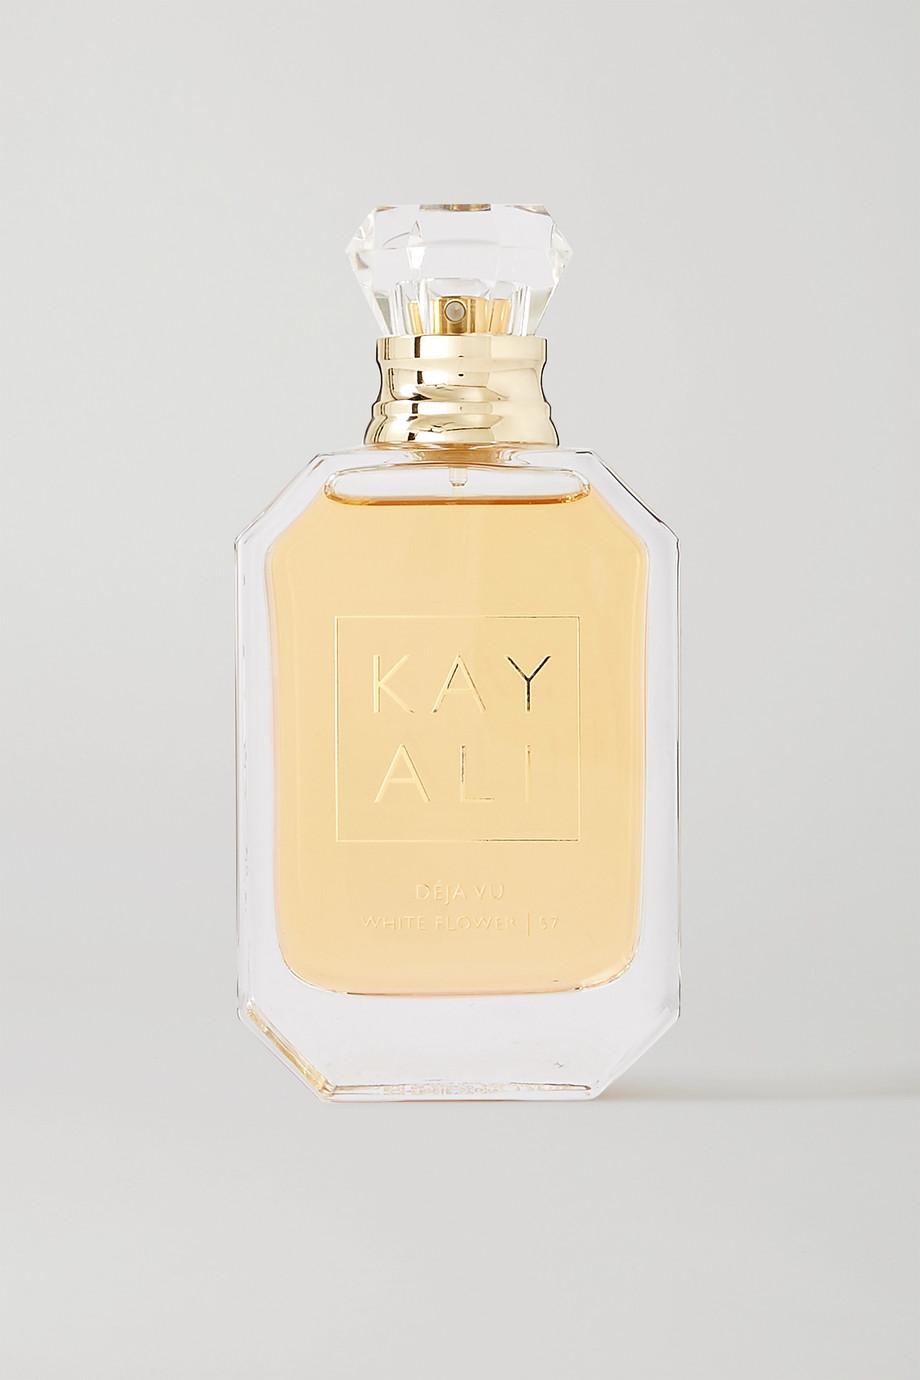 Huda Beauty Eau de parfum Kayali Déjà Vu White Flower 57, 50 ml